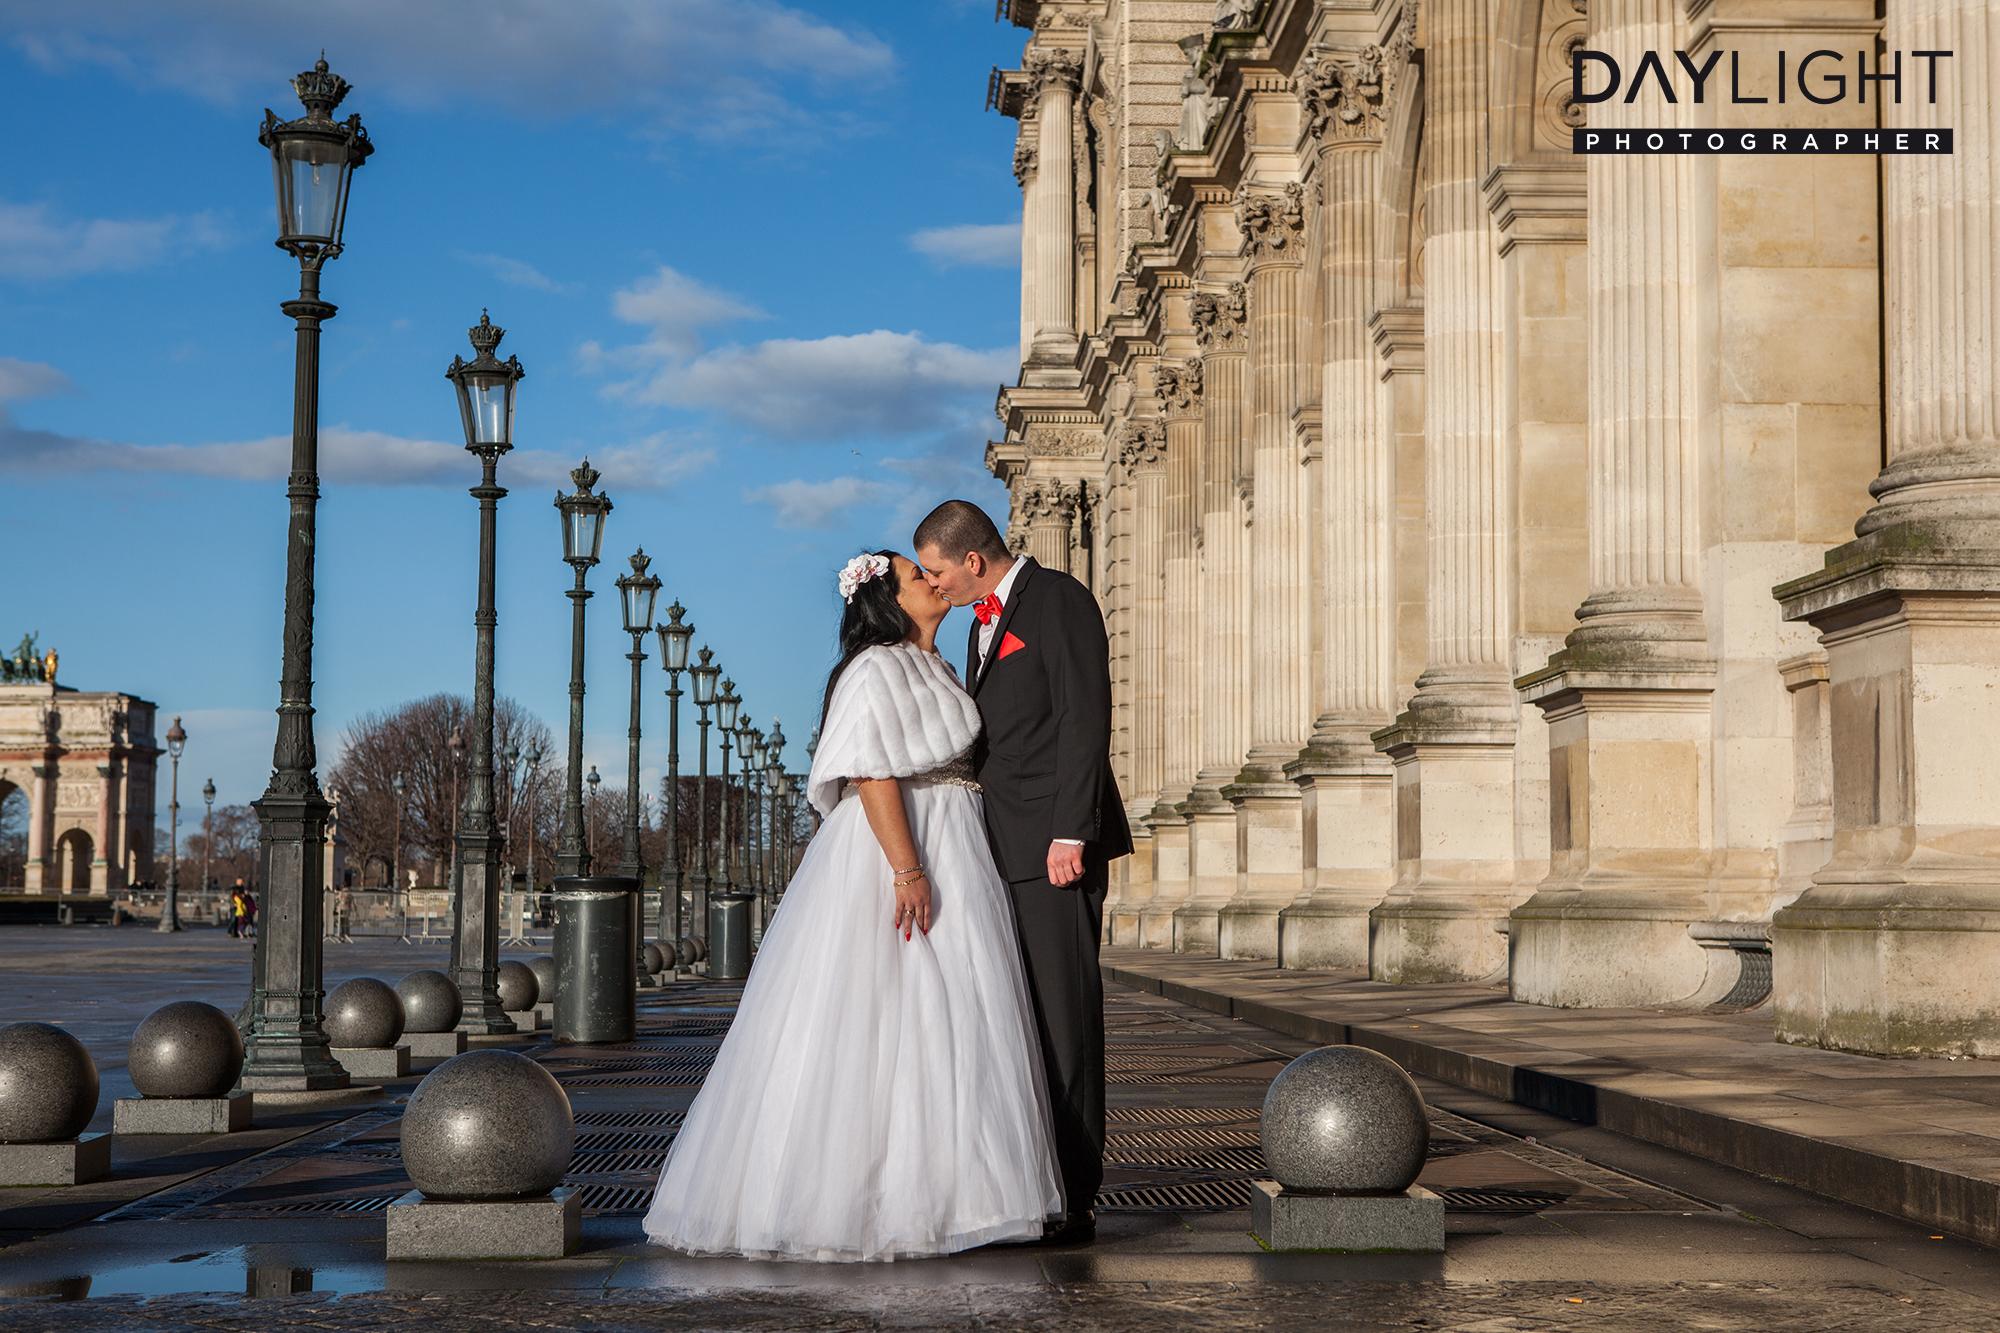 fotoshooting louvre paris Fotografen Paris bieten ein Fotoshooting in Paris?